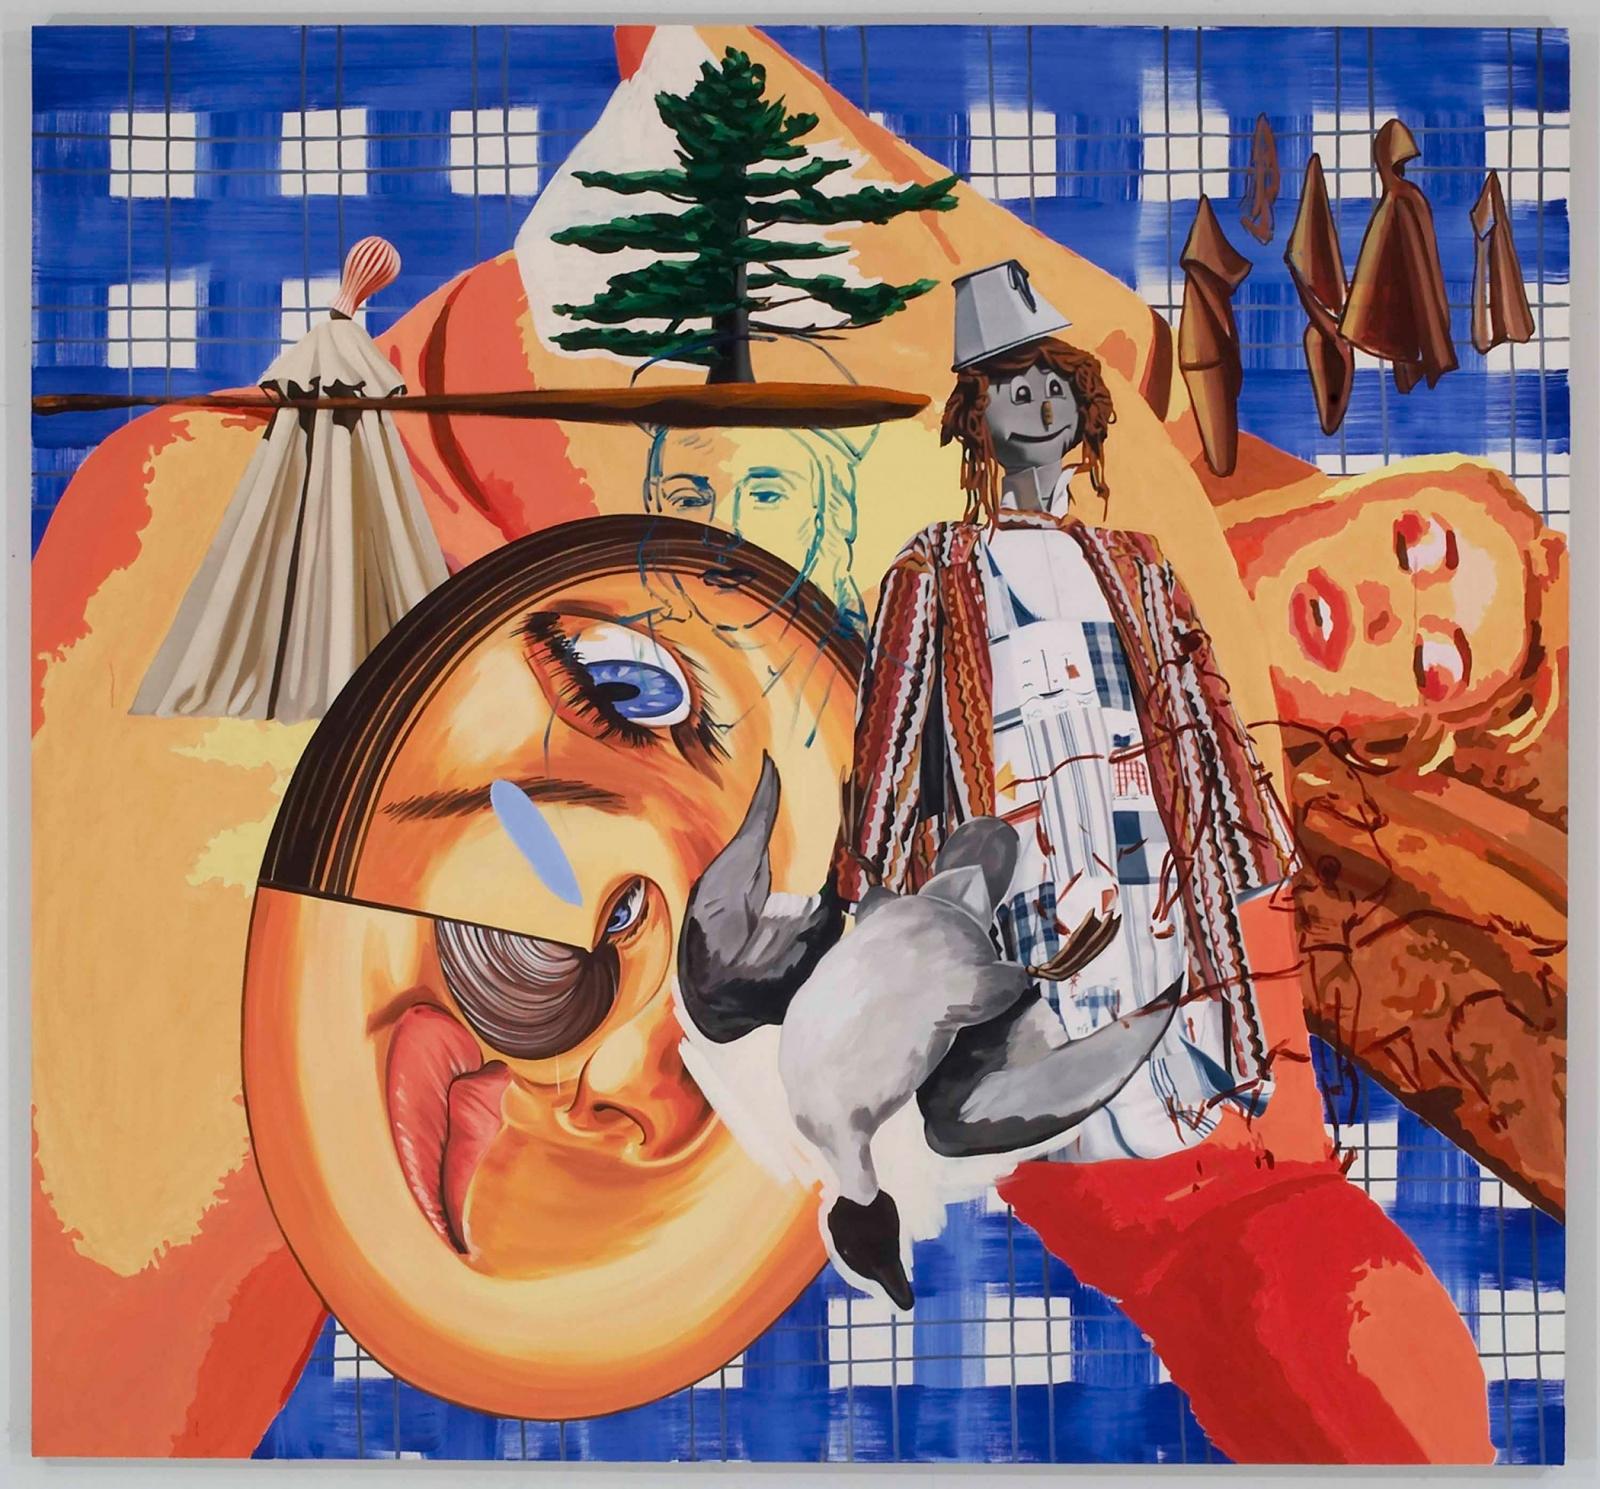 DAVID SALLE, The Scarecrows, 2006